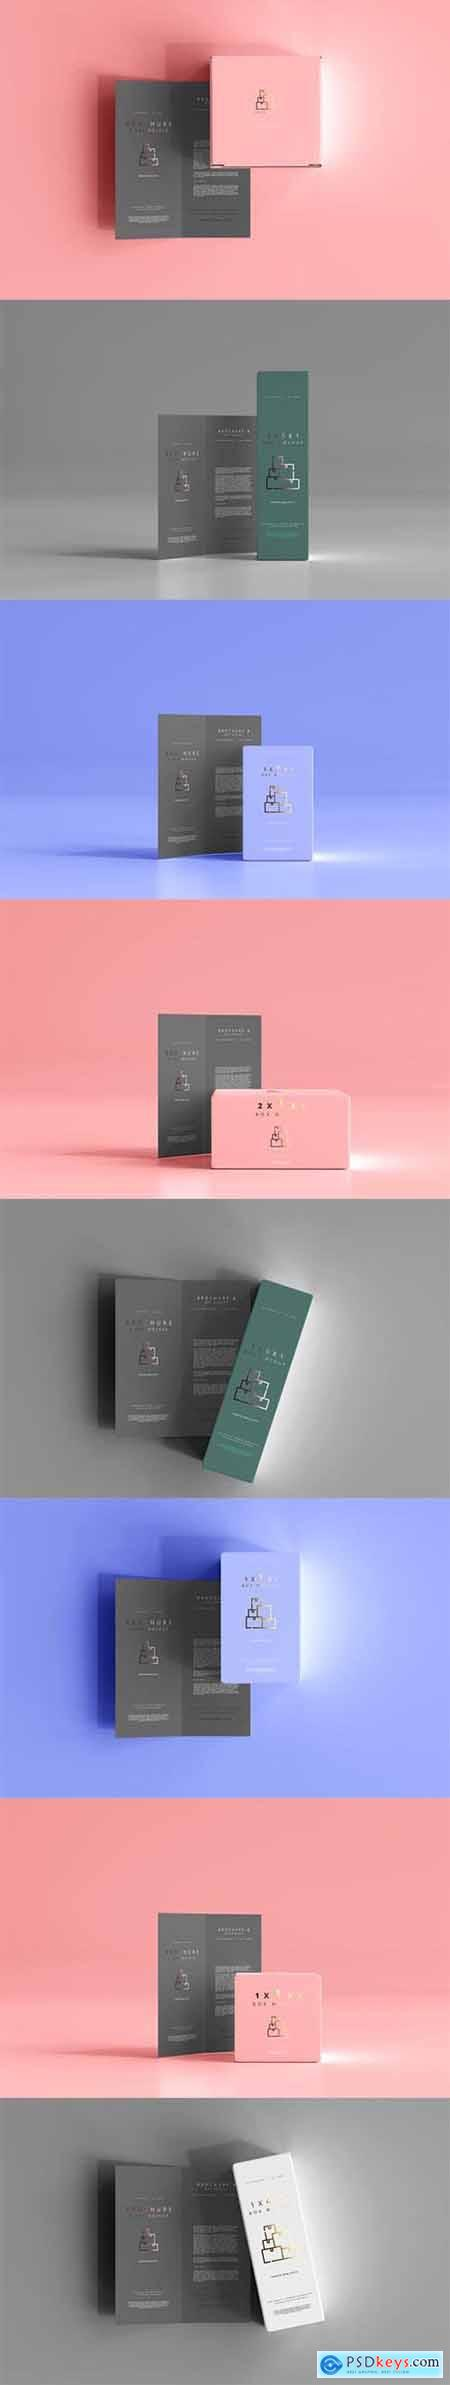 Box with bi-fold brochure mockup